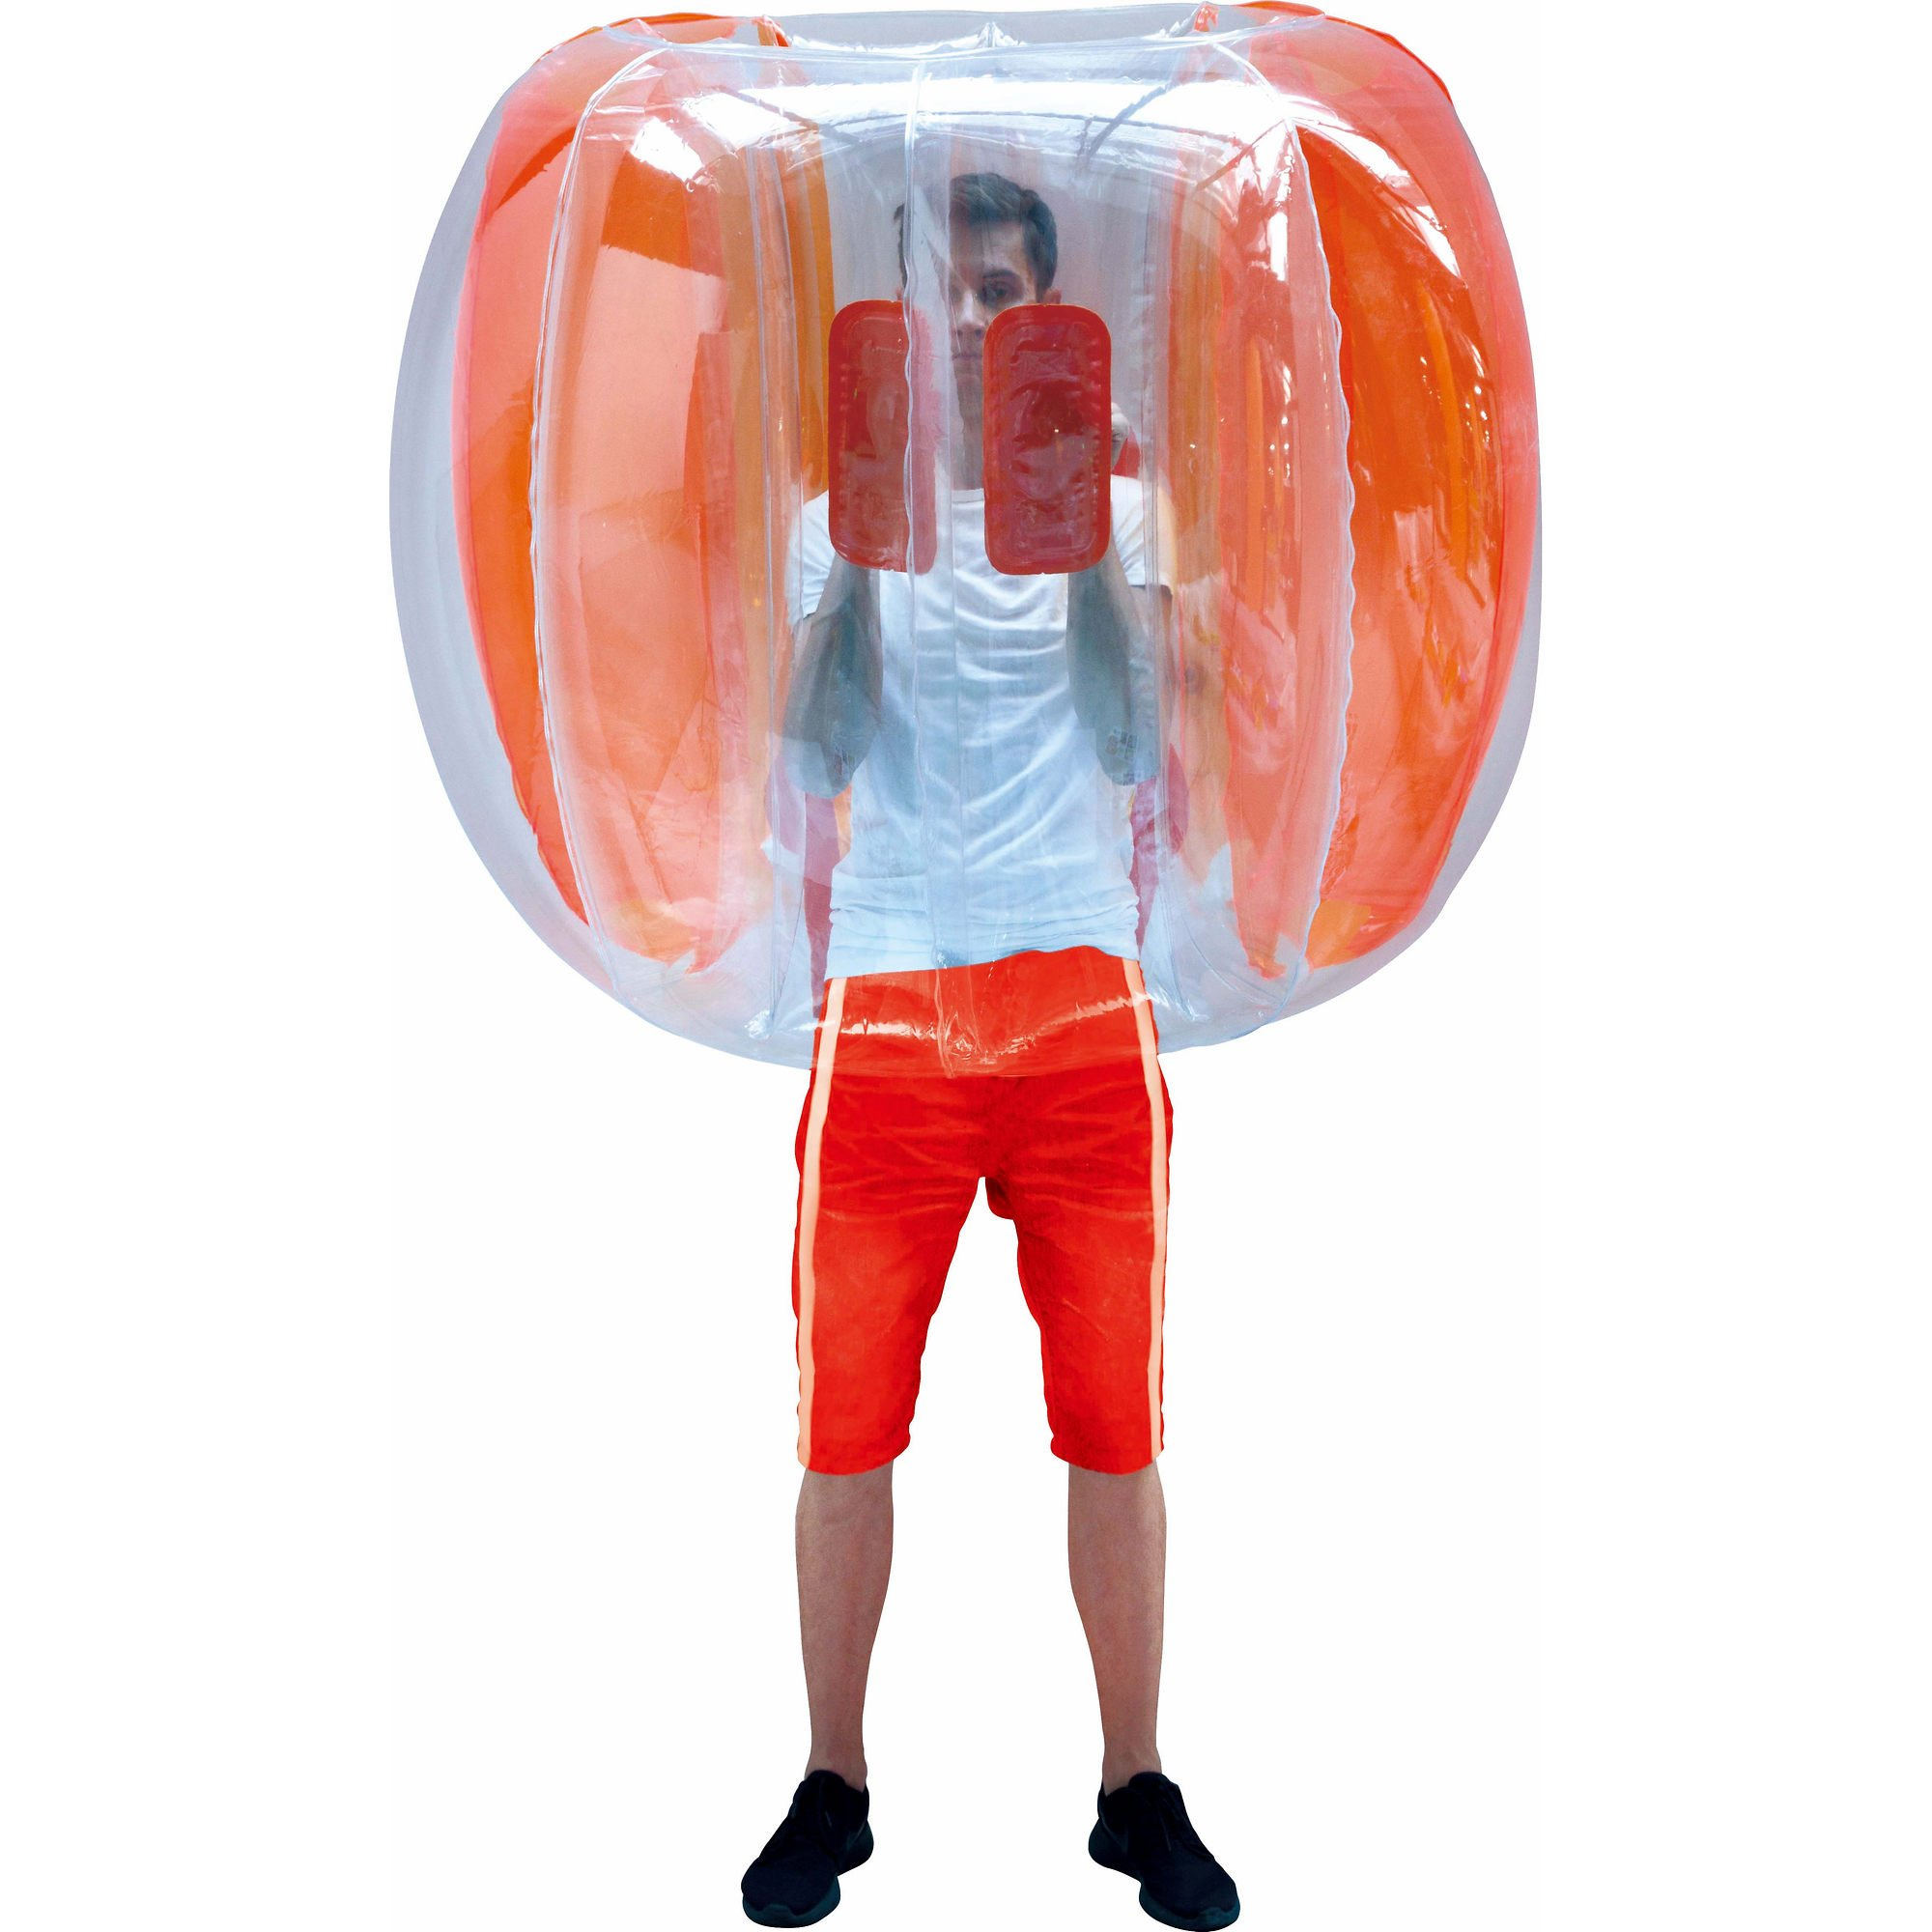 Zuru X-Shot Super Durable Human 4' Bubble Ball - Orange by Zuru (Image #2)